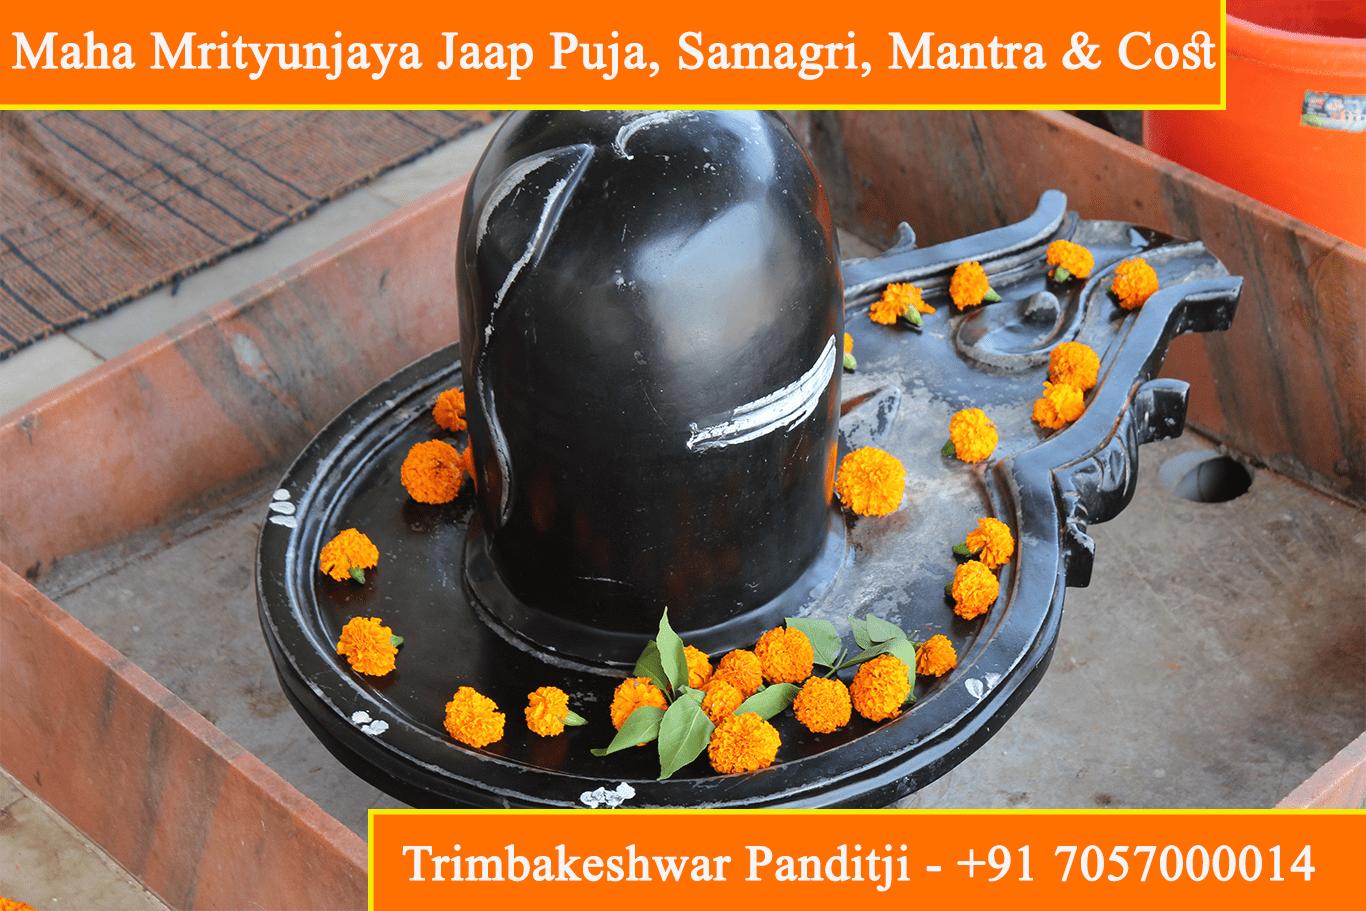 Maha Mrityunjaya Jaap Puja Vidhi, Samagri, Benefits, Cost And Mantra